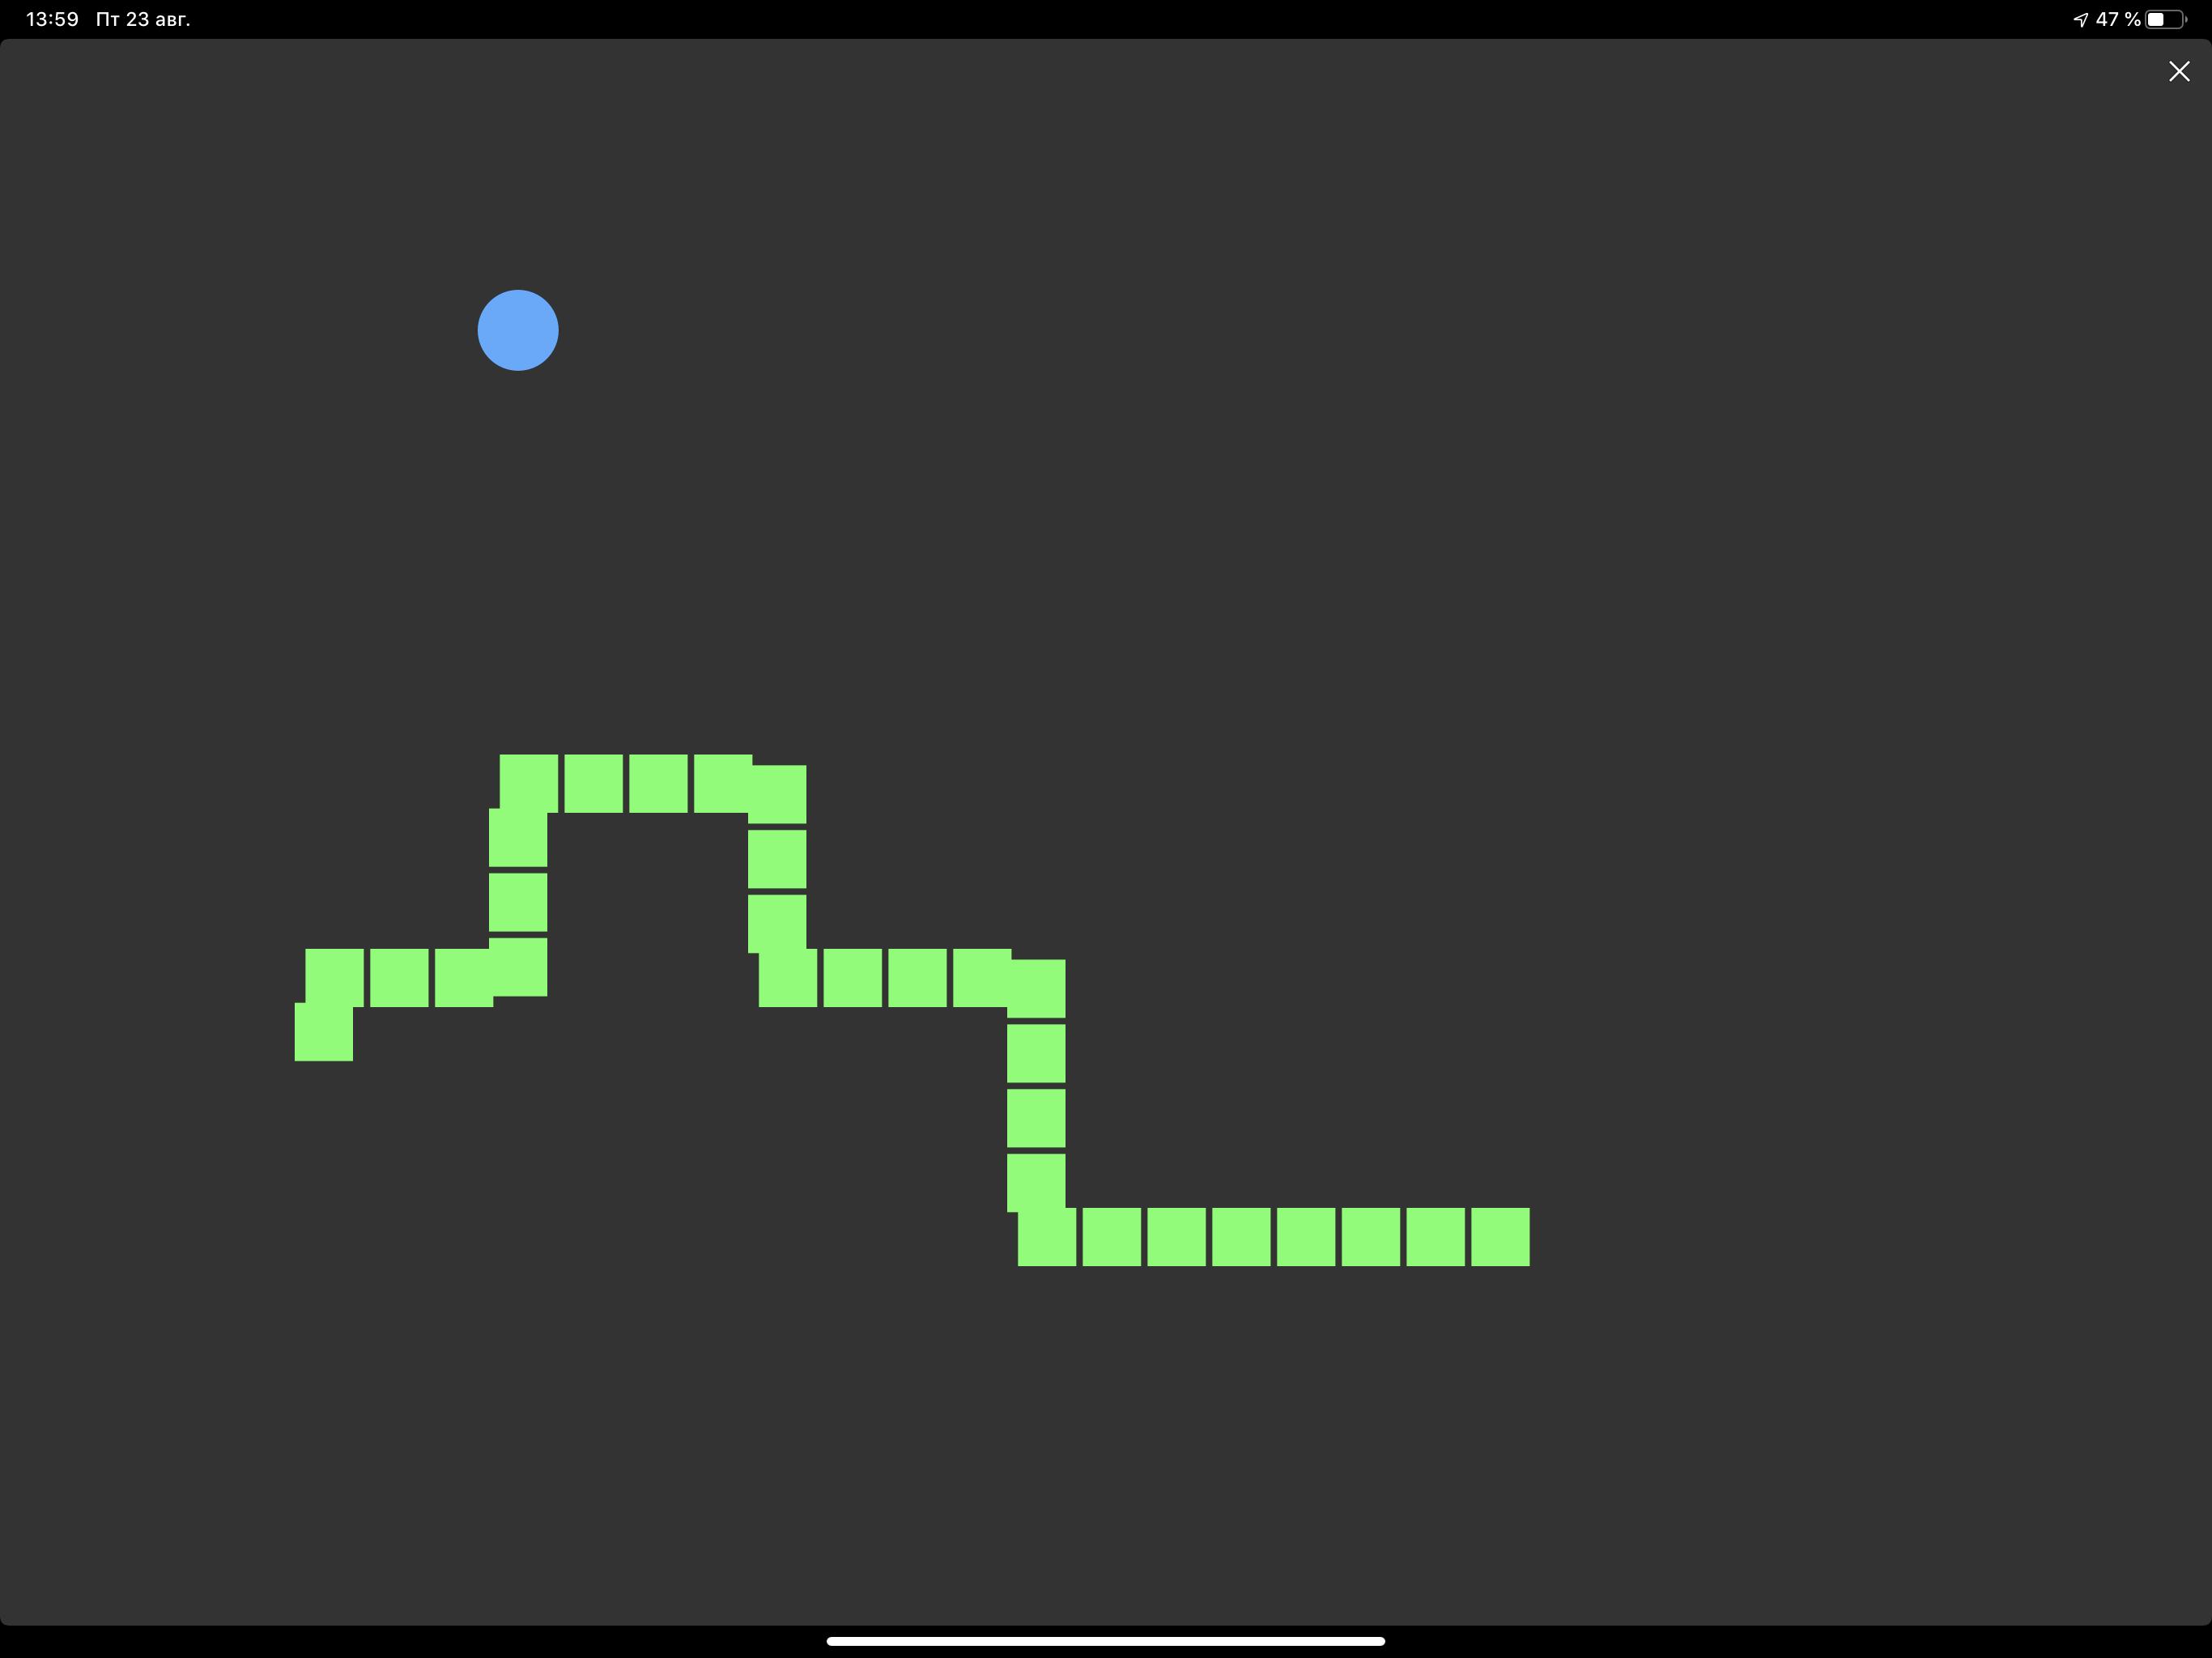 Написание змейки на ipad (pythonista) - 17